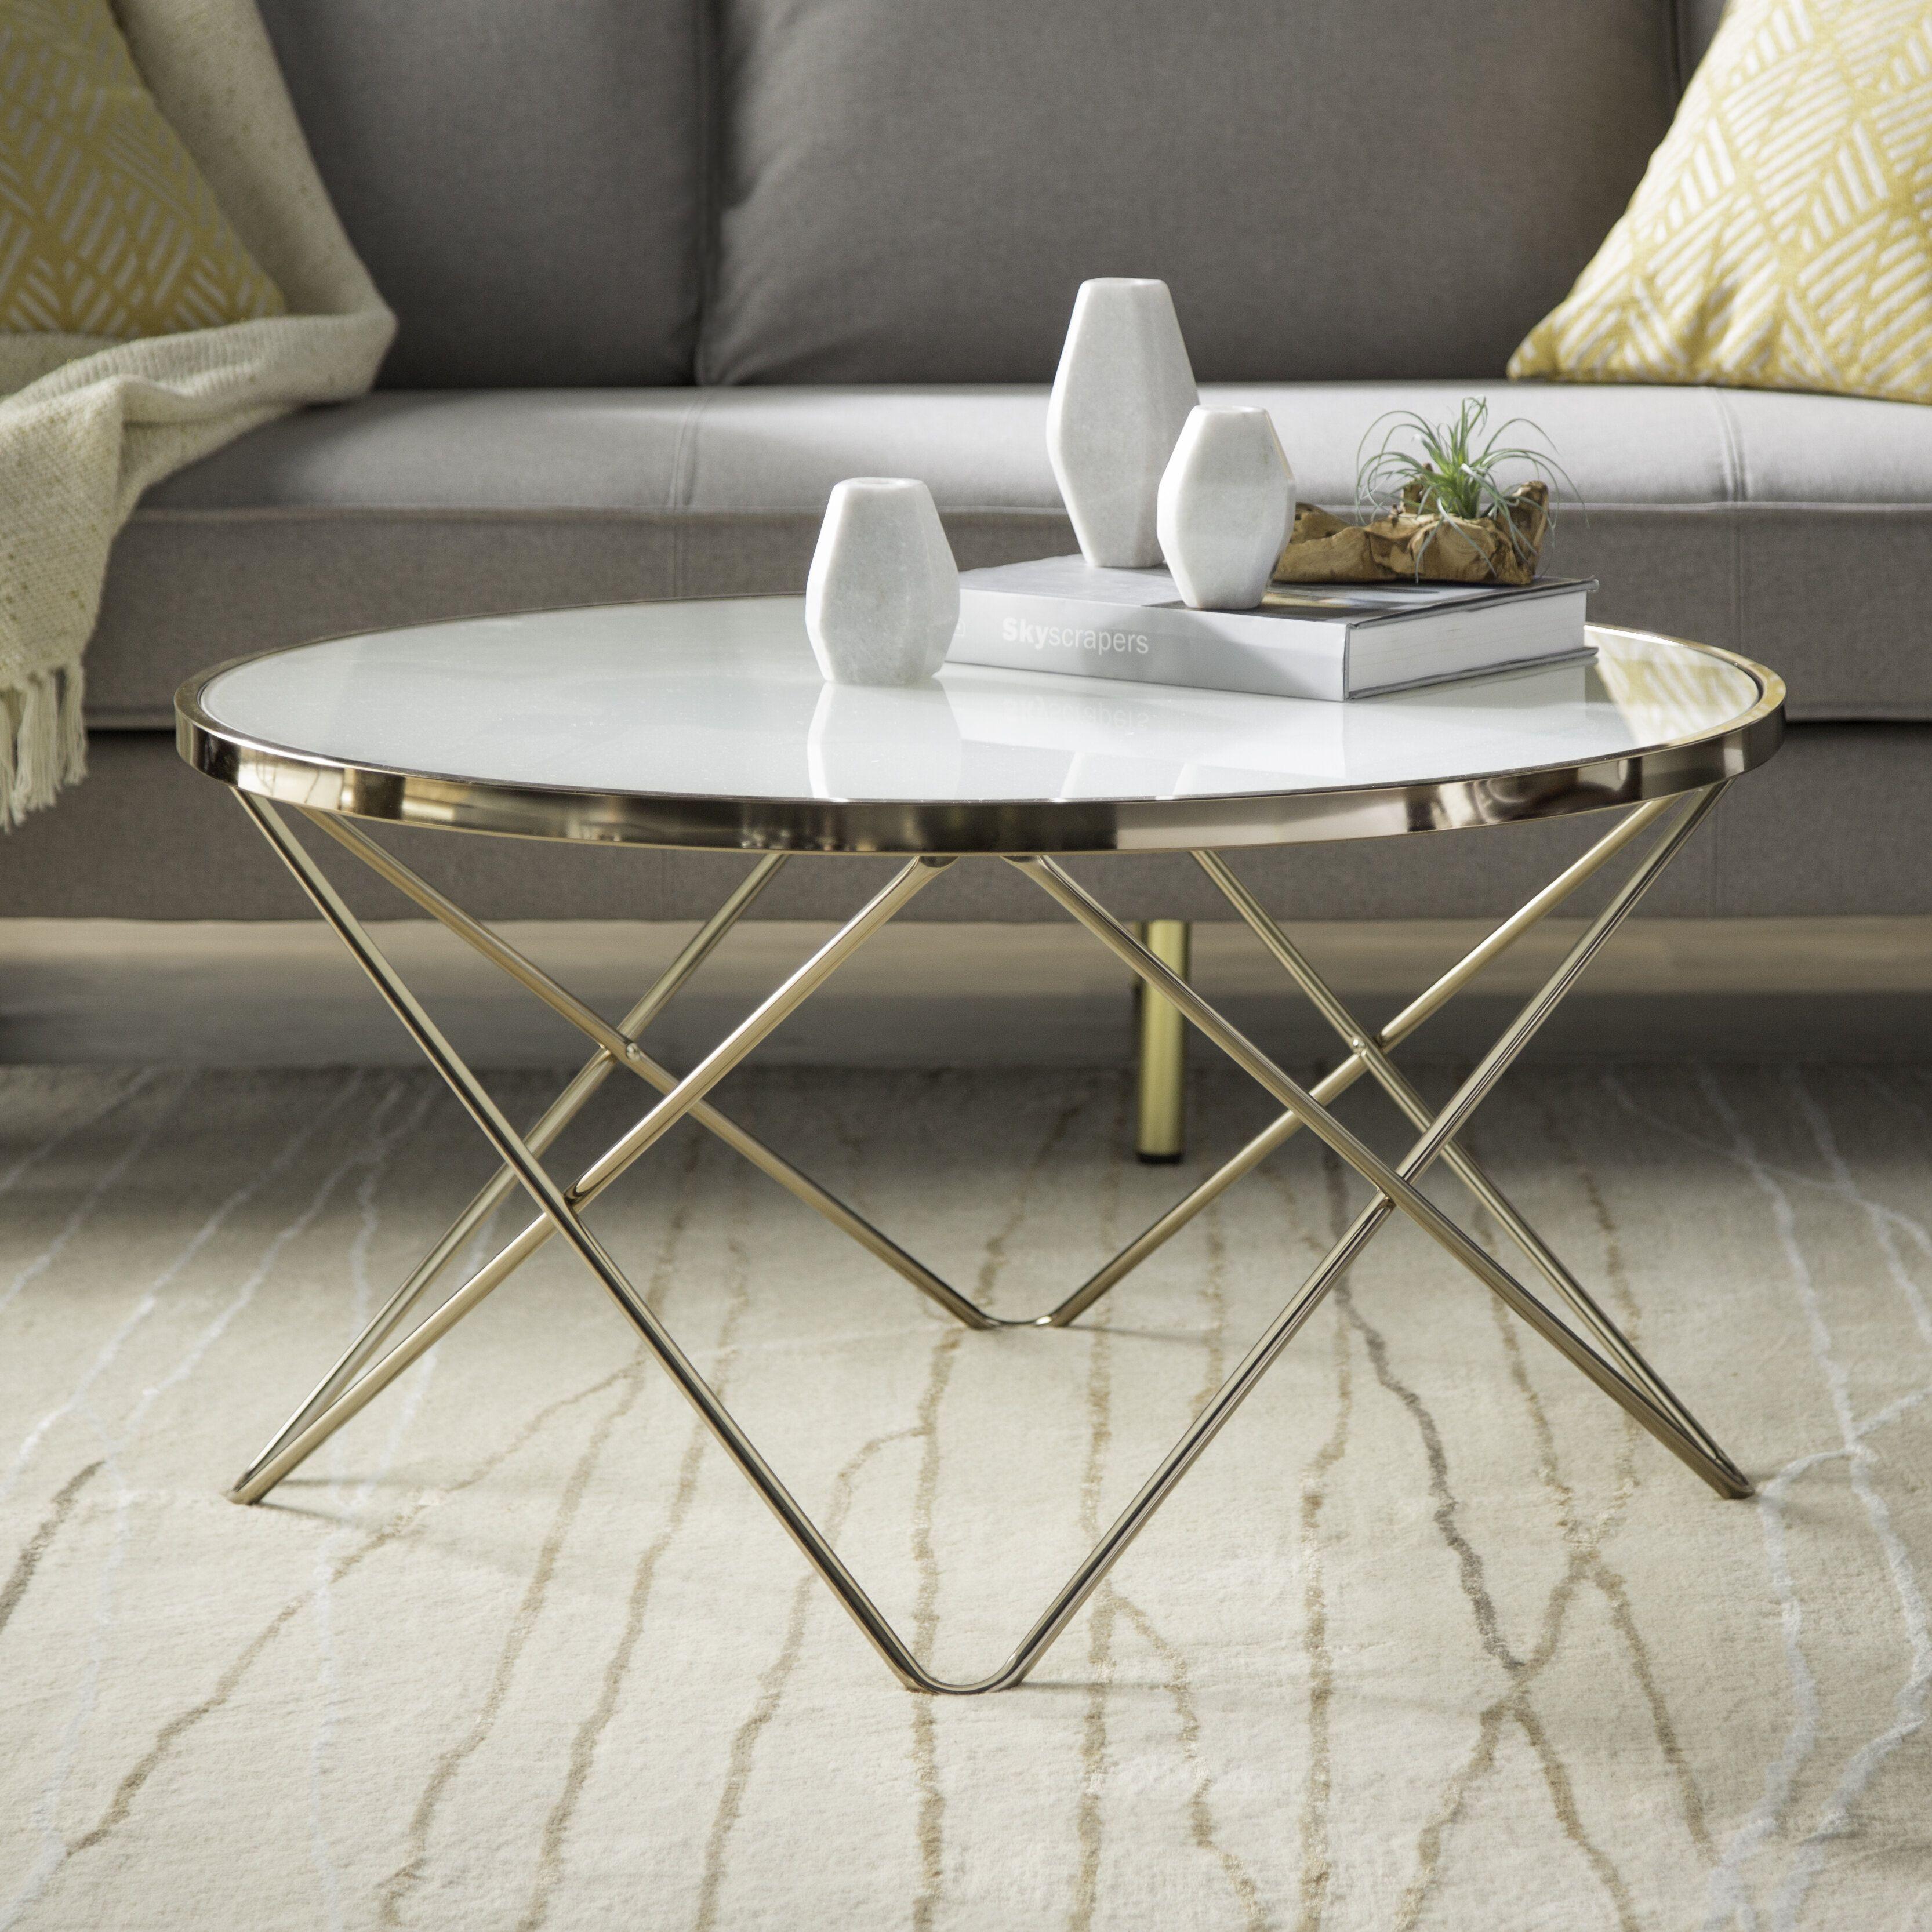 Petite Table Ronde Salon Elegant Table Basse En Metal Avec Plateau